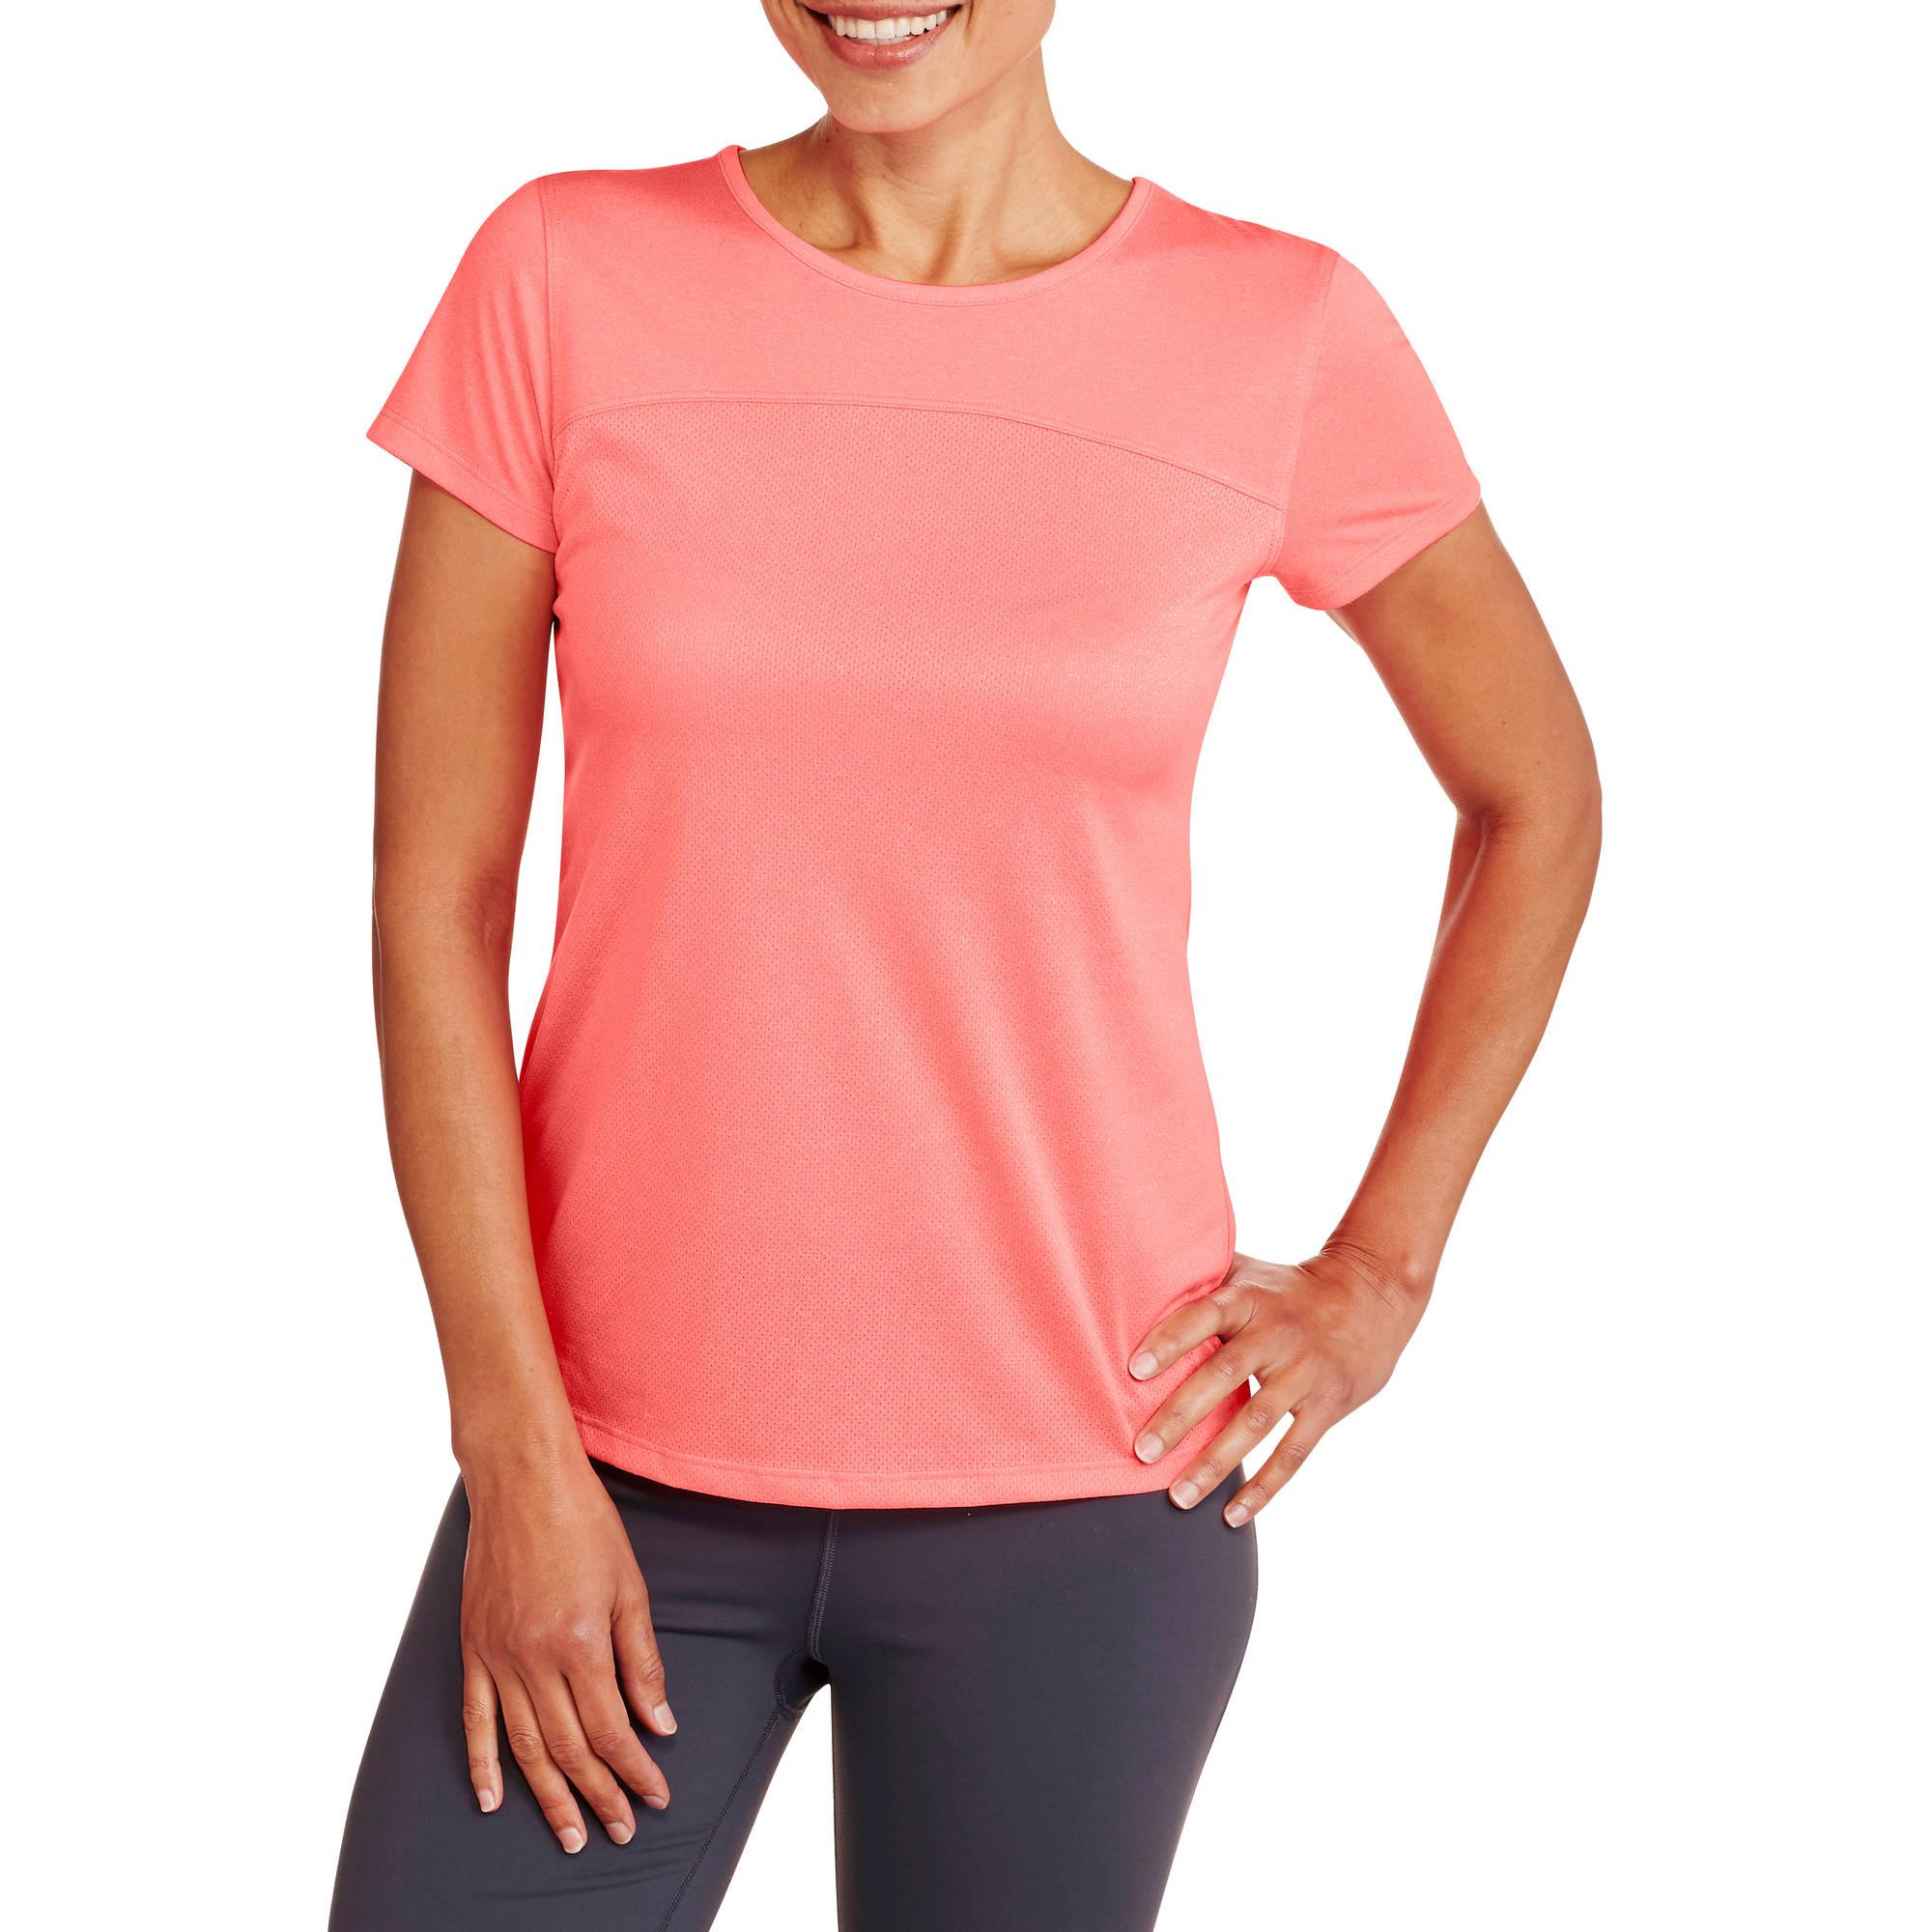 Danskin Now Women's Active Short Sleeve T-Shirt with Back Vent